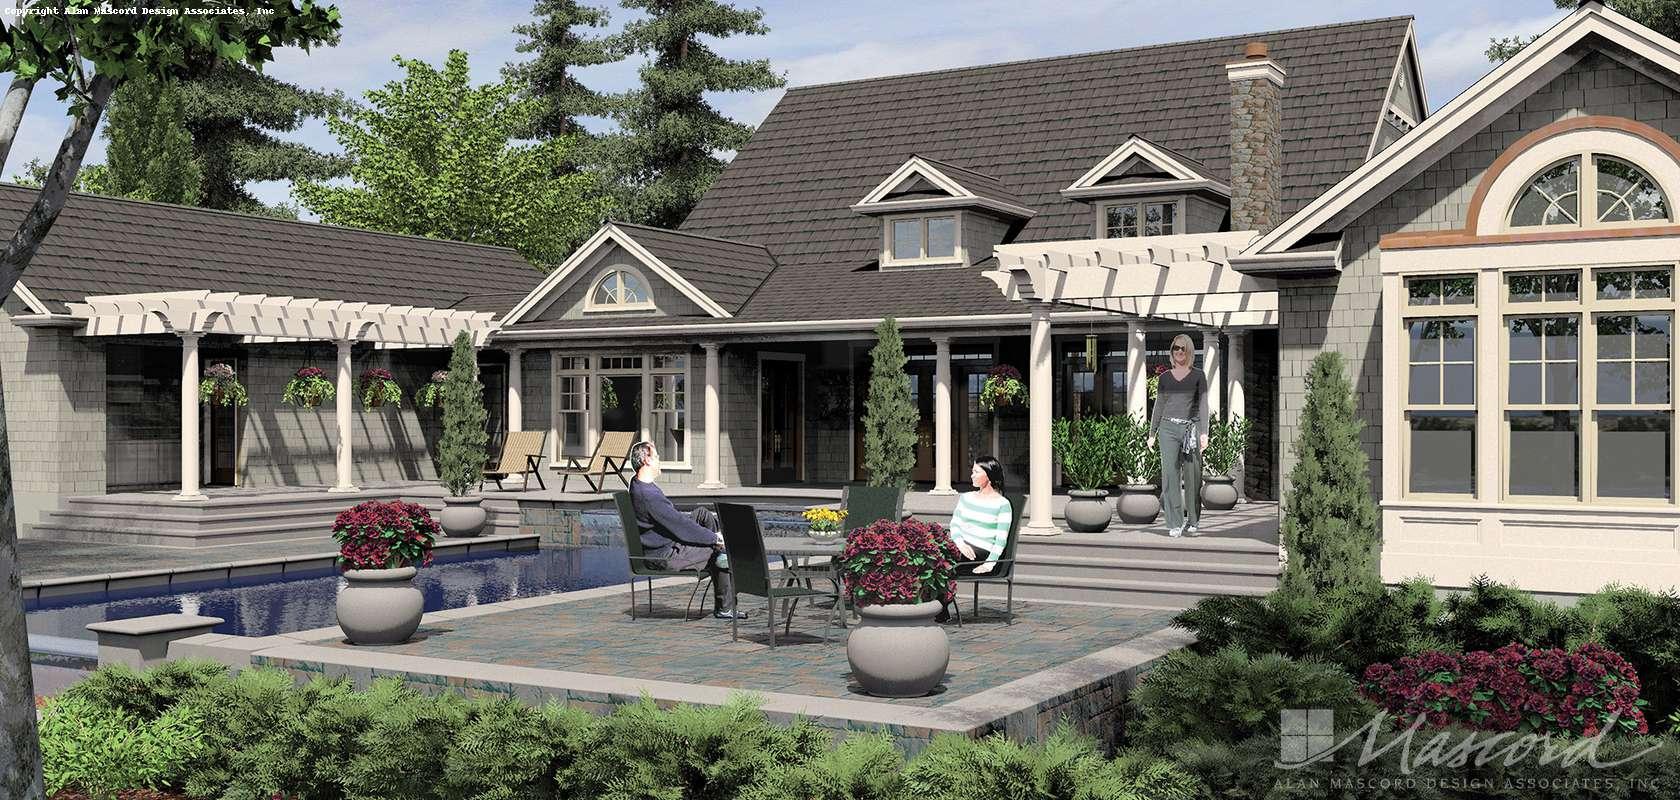 Mascord House Plan 2443: The Seligman